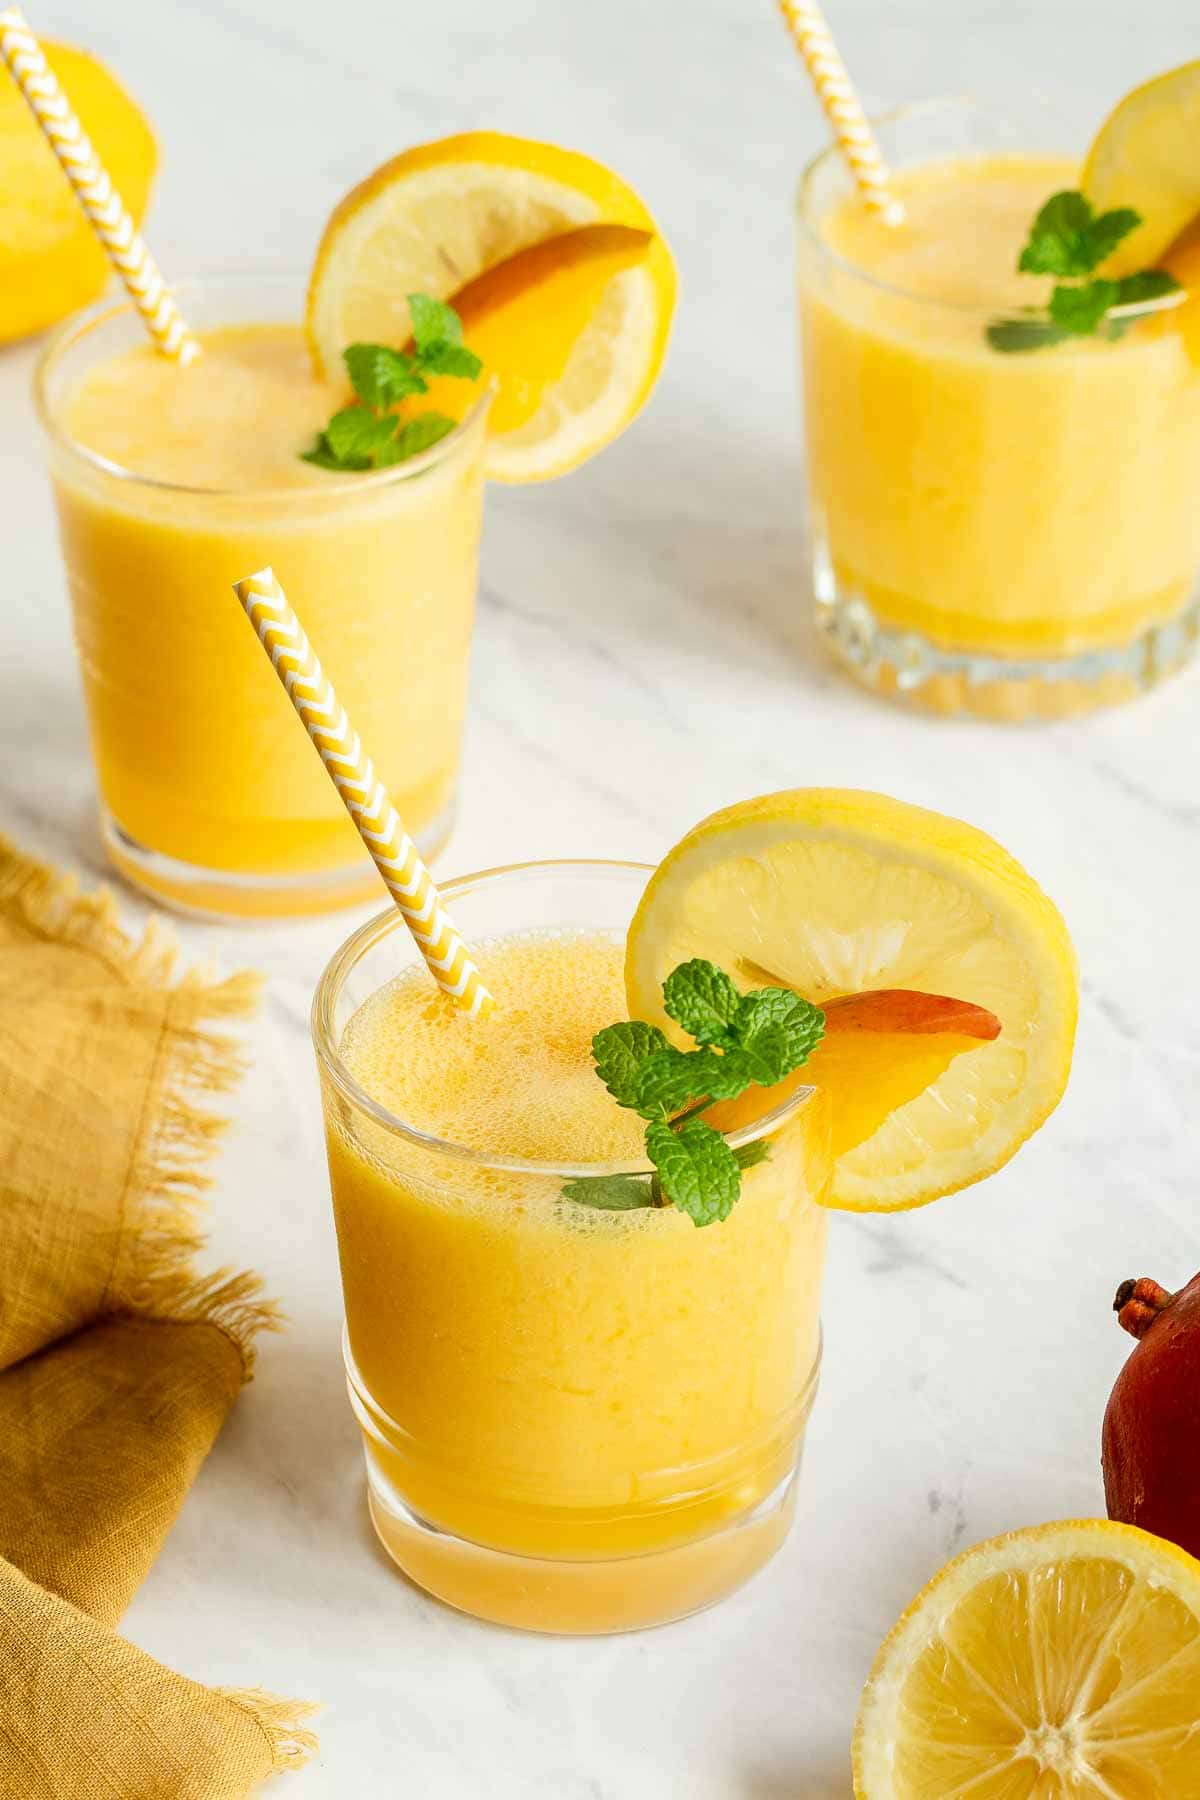 Three glasses of mango lemonade with straws and lemon rounds.